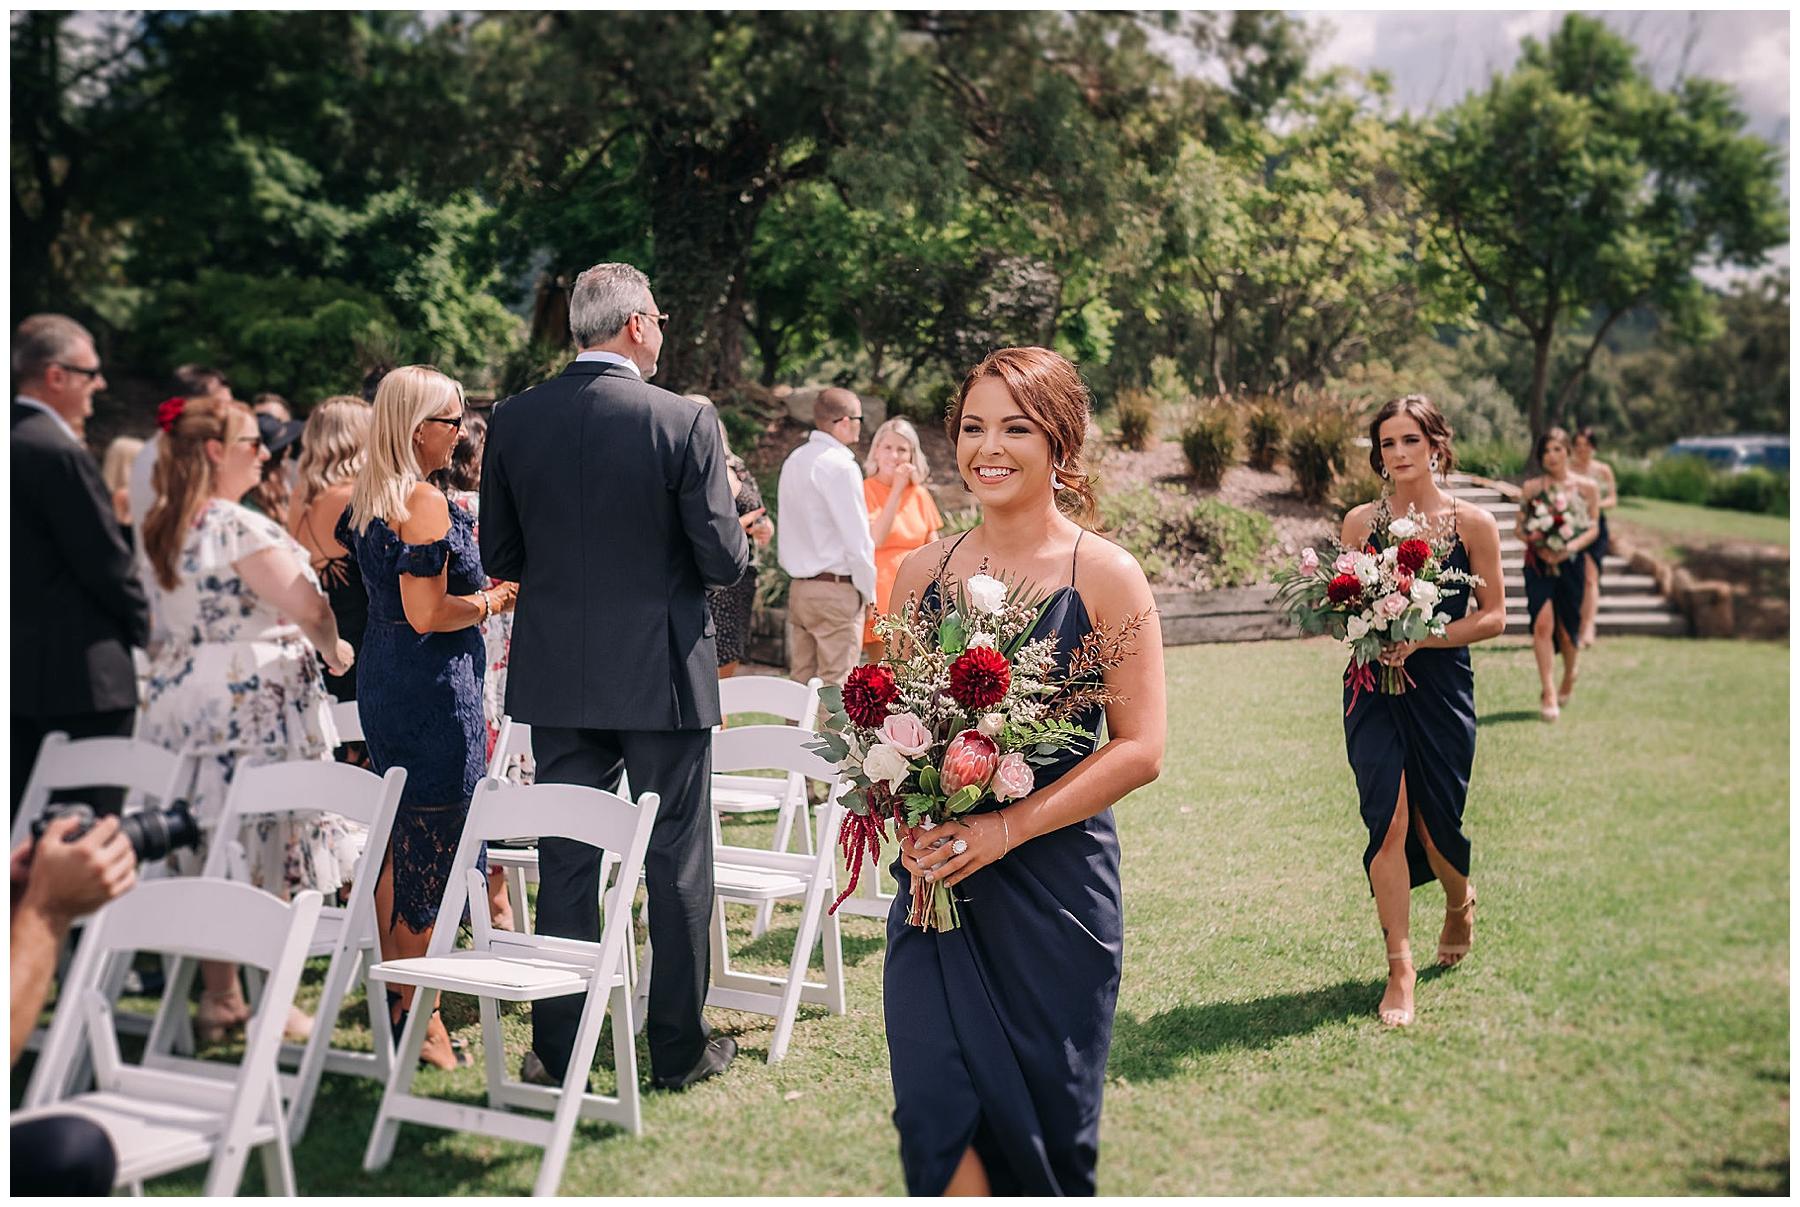 Adam's Peak Wedding Photos + Popcorn Photography_0018.jpg